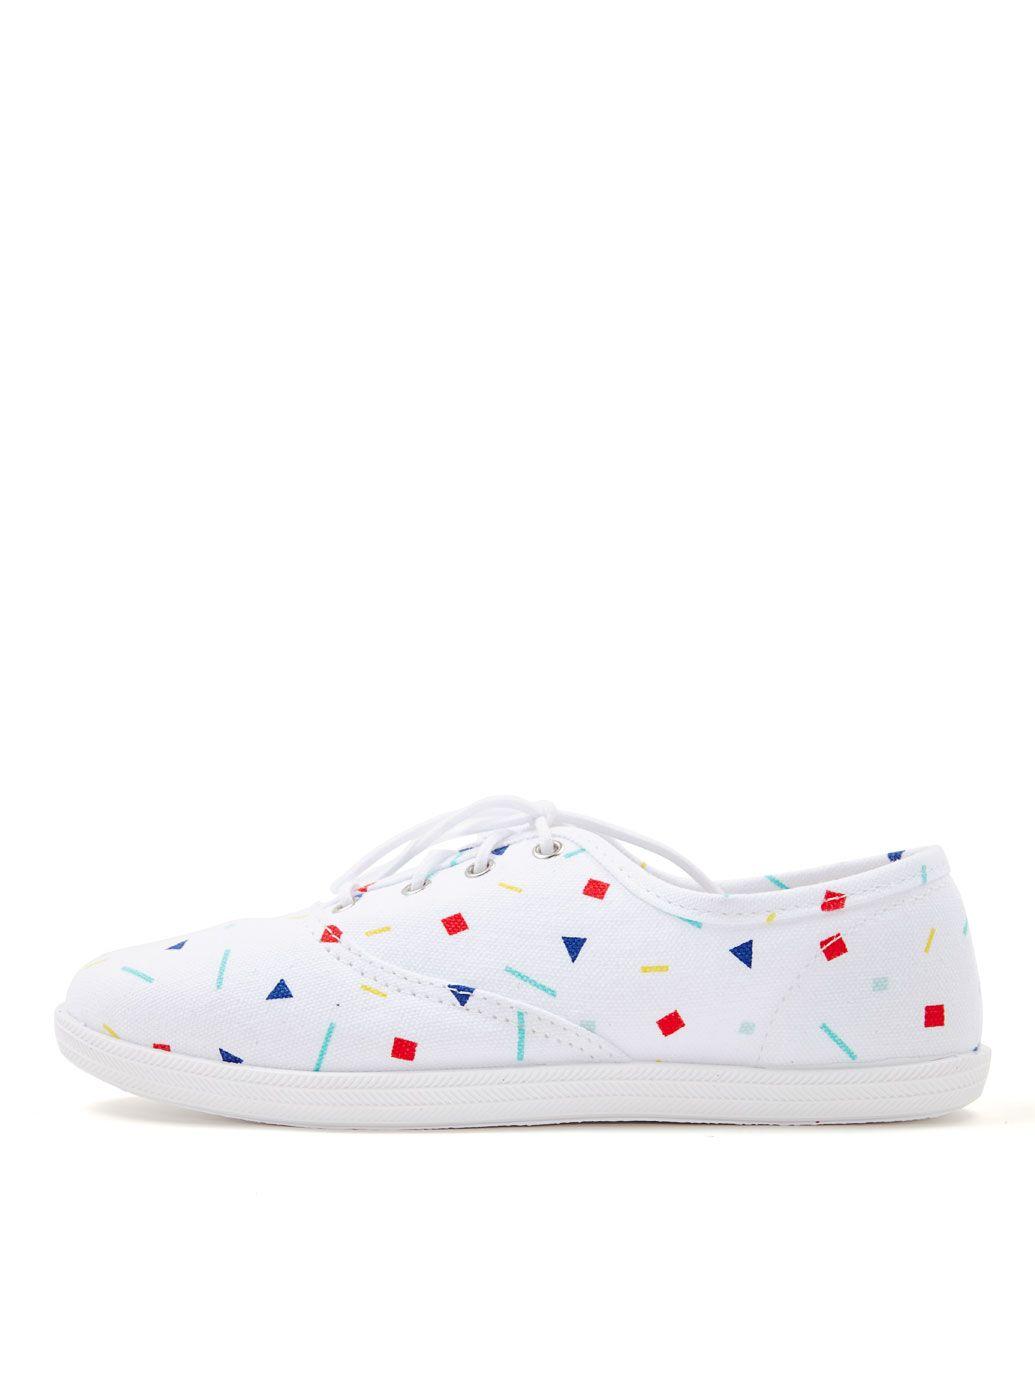 unisex printed tennis shoe american apparel